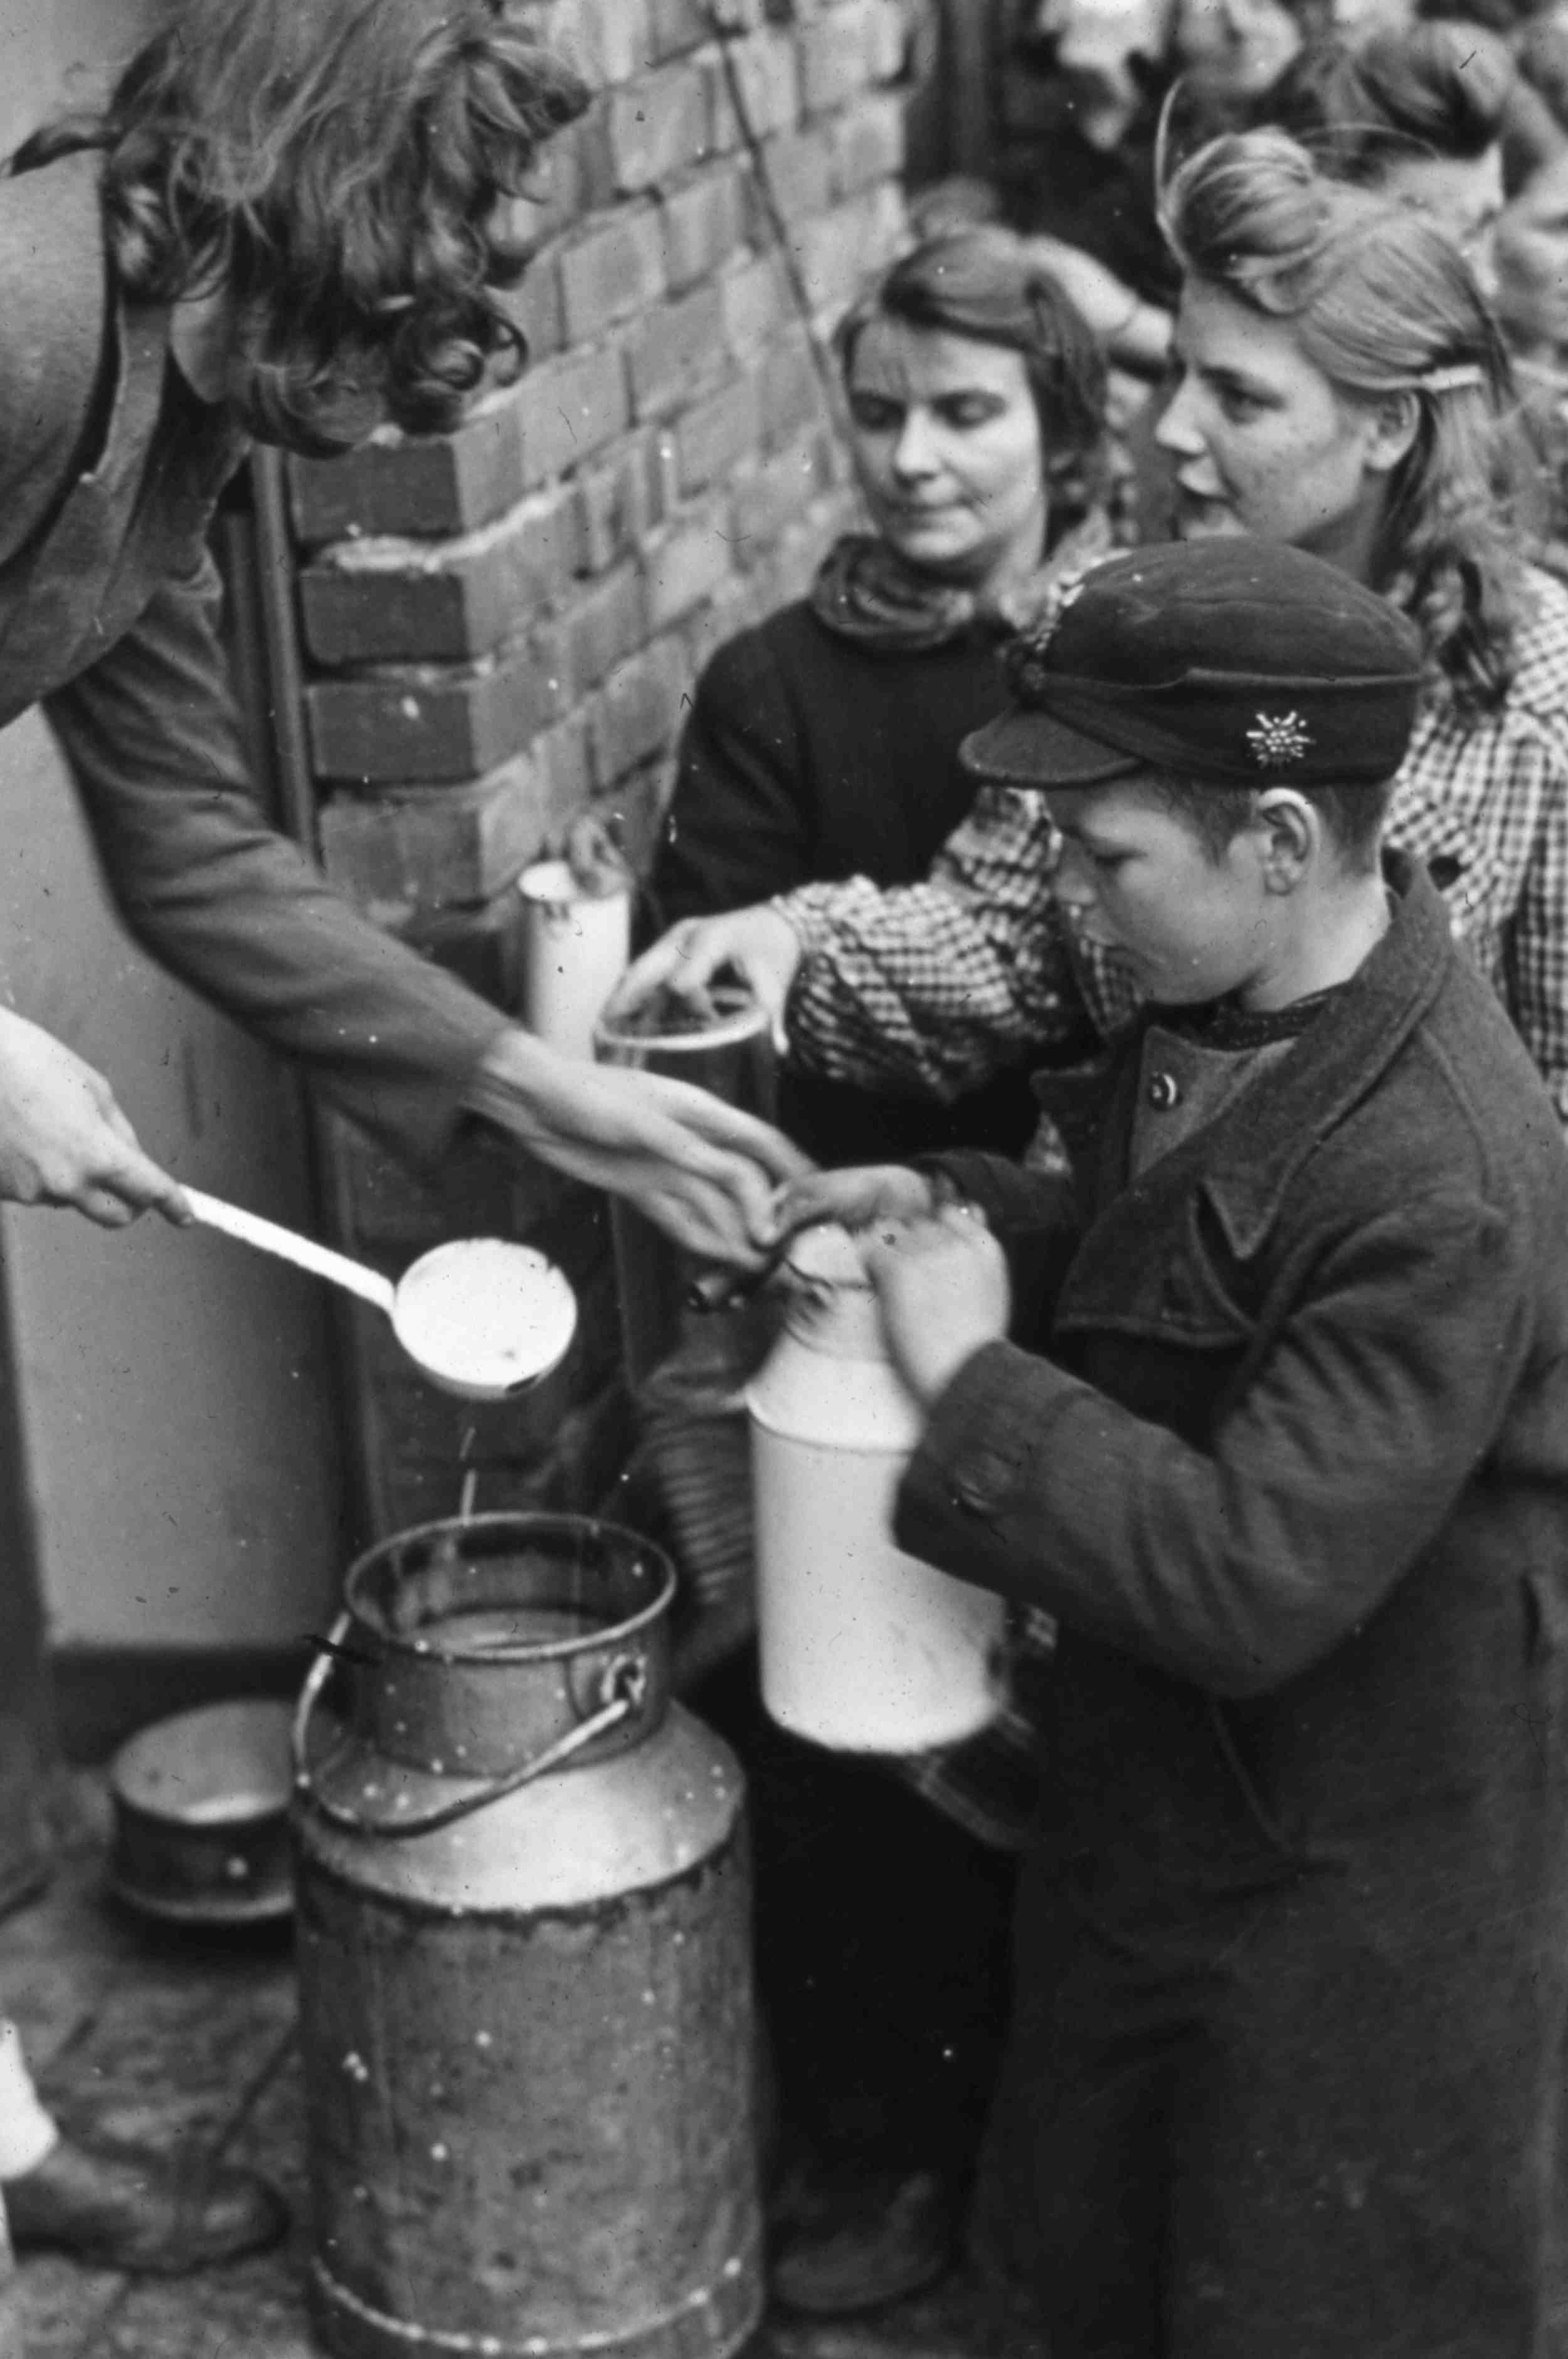 March 1945. Civilians stand in a milk line near Manheim, Germany.